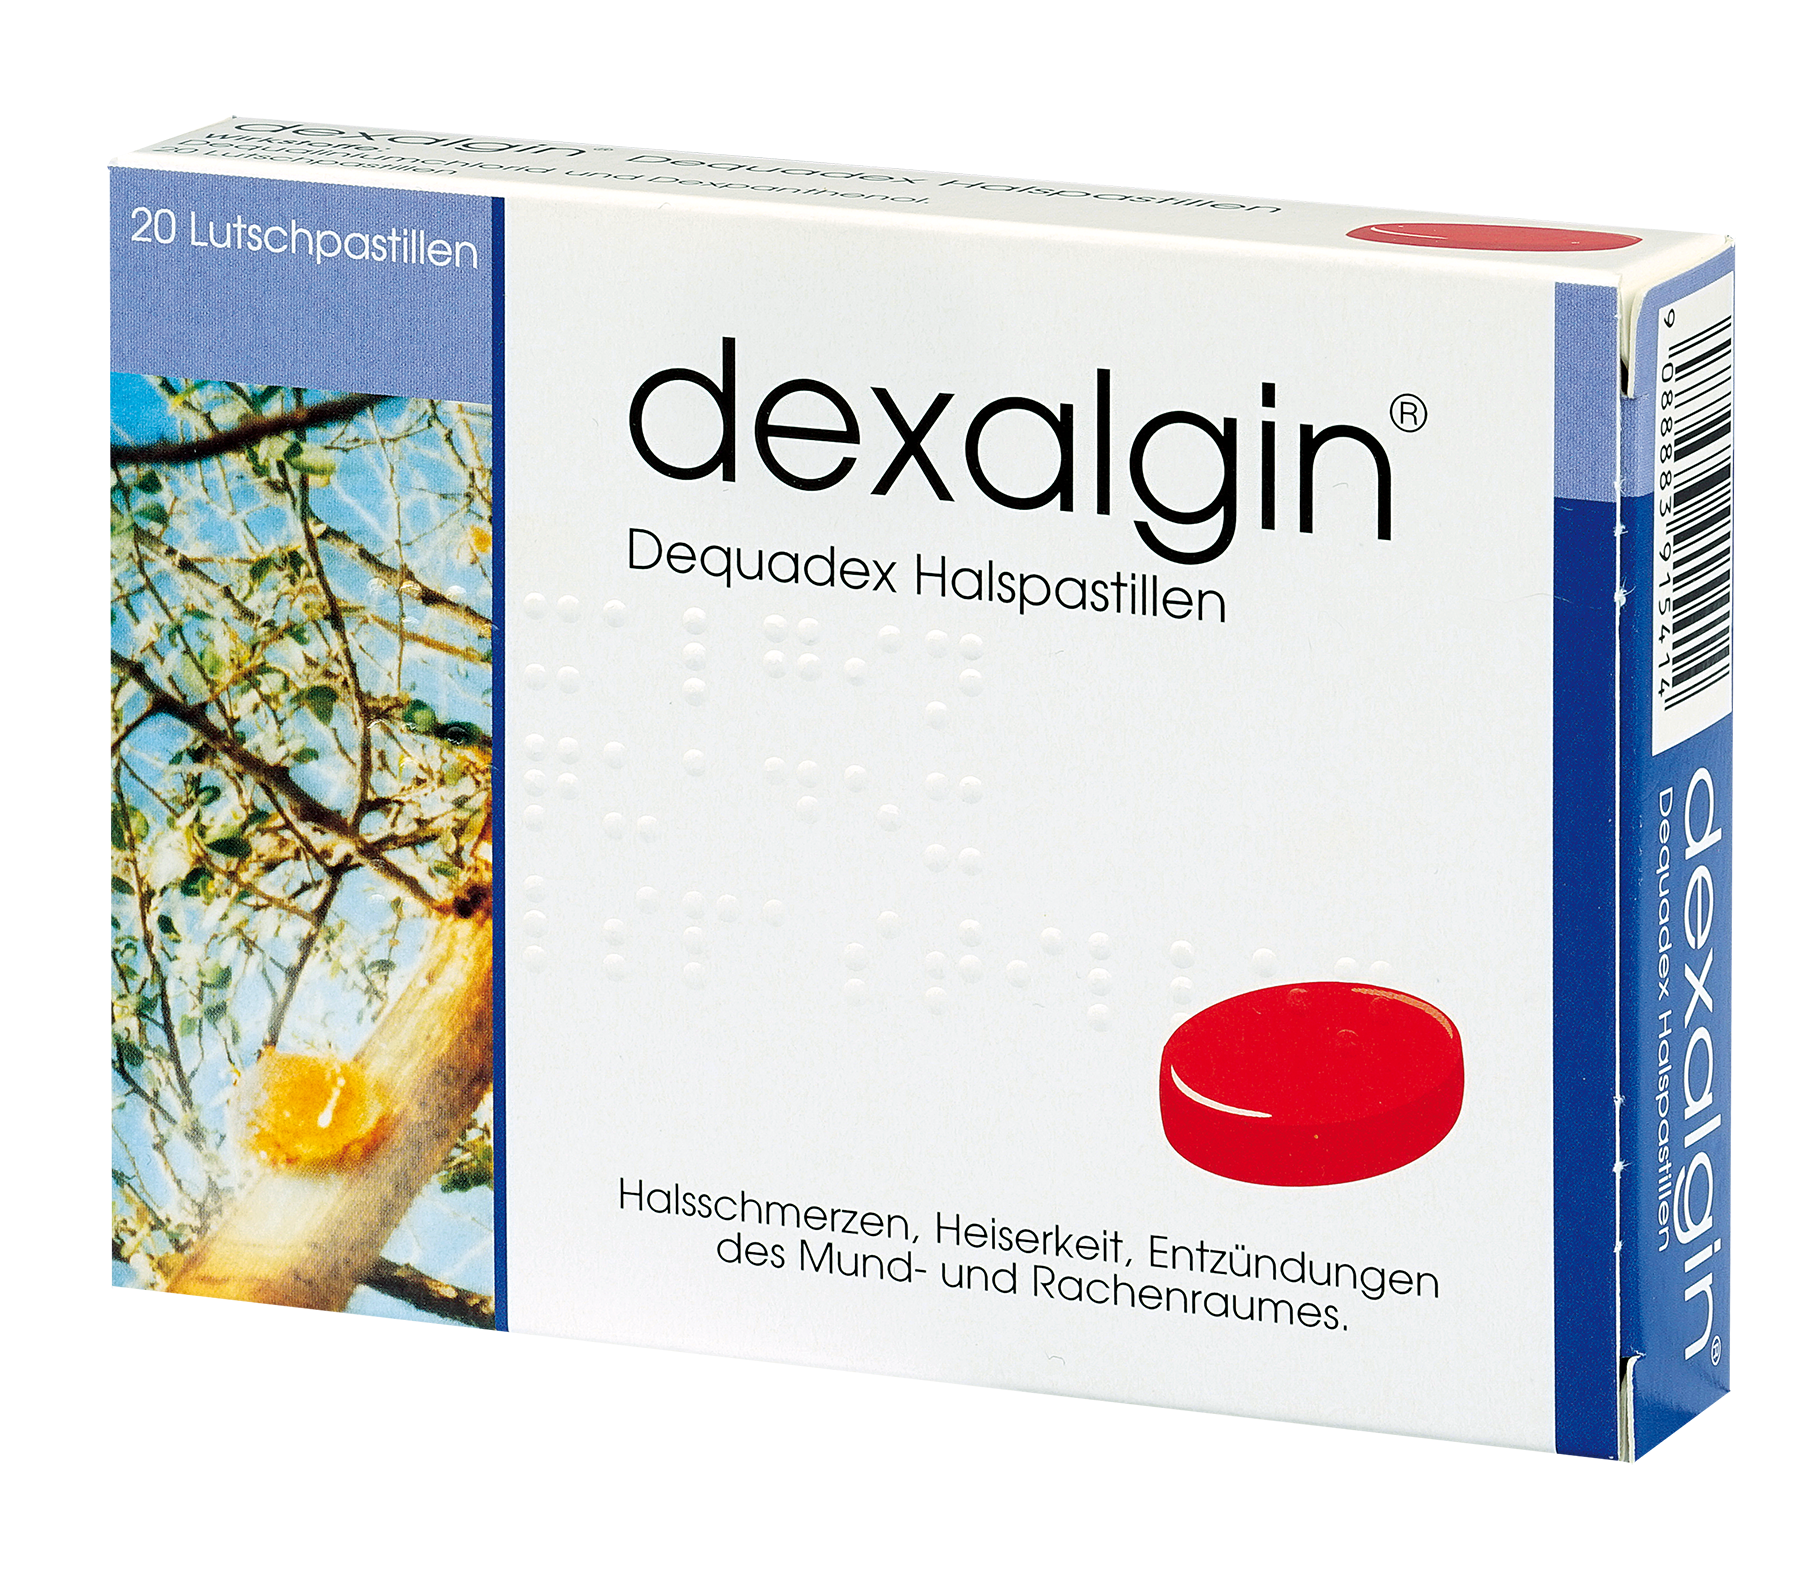 dexalgin Dequadex - Halspastillen